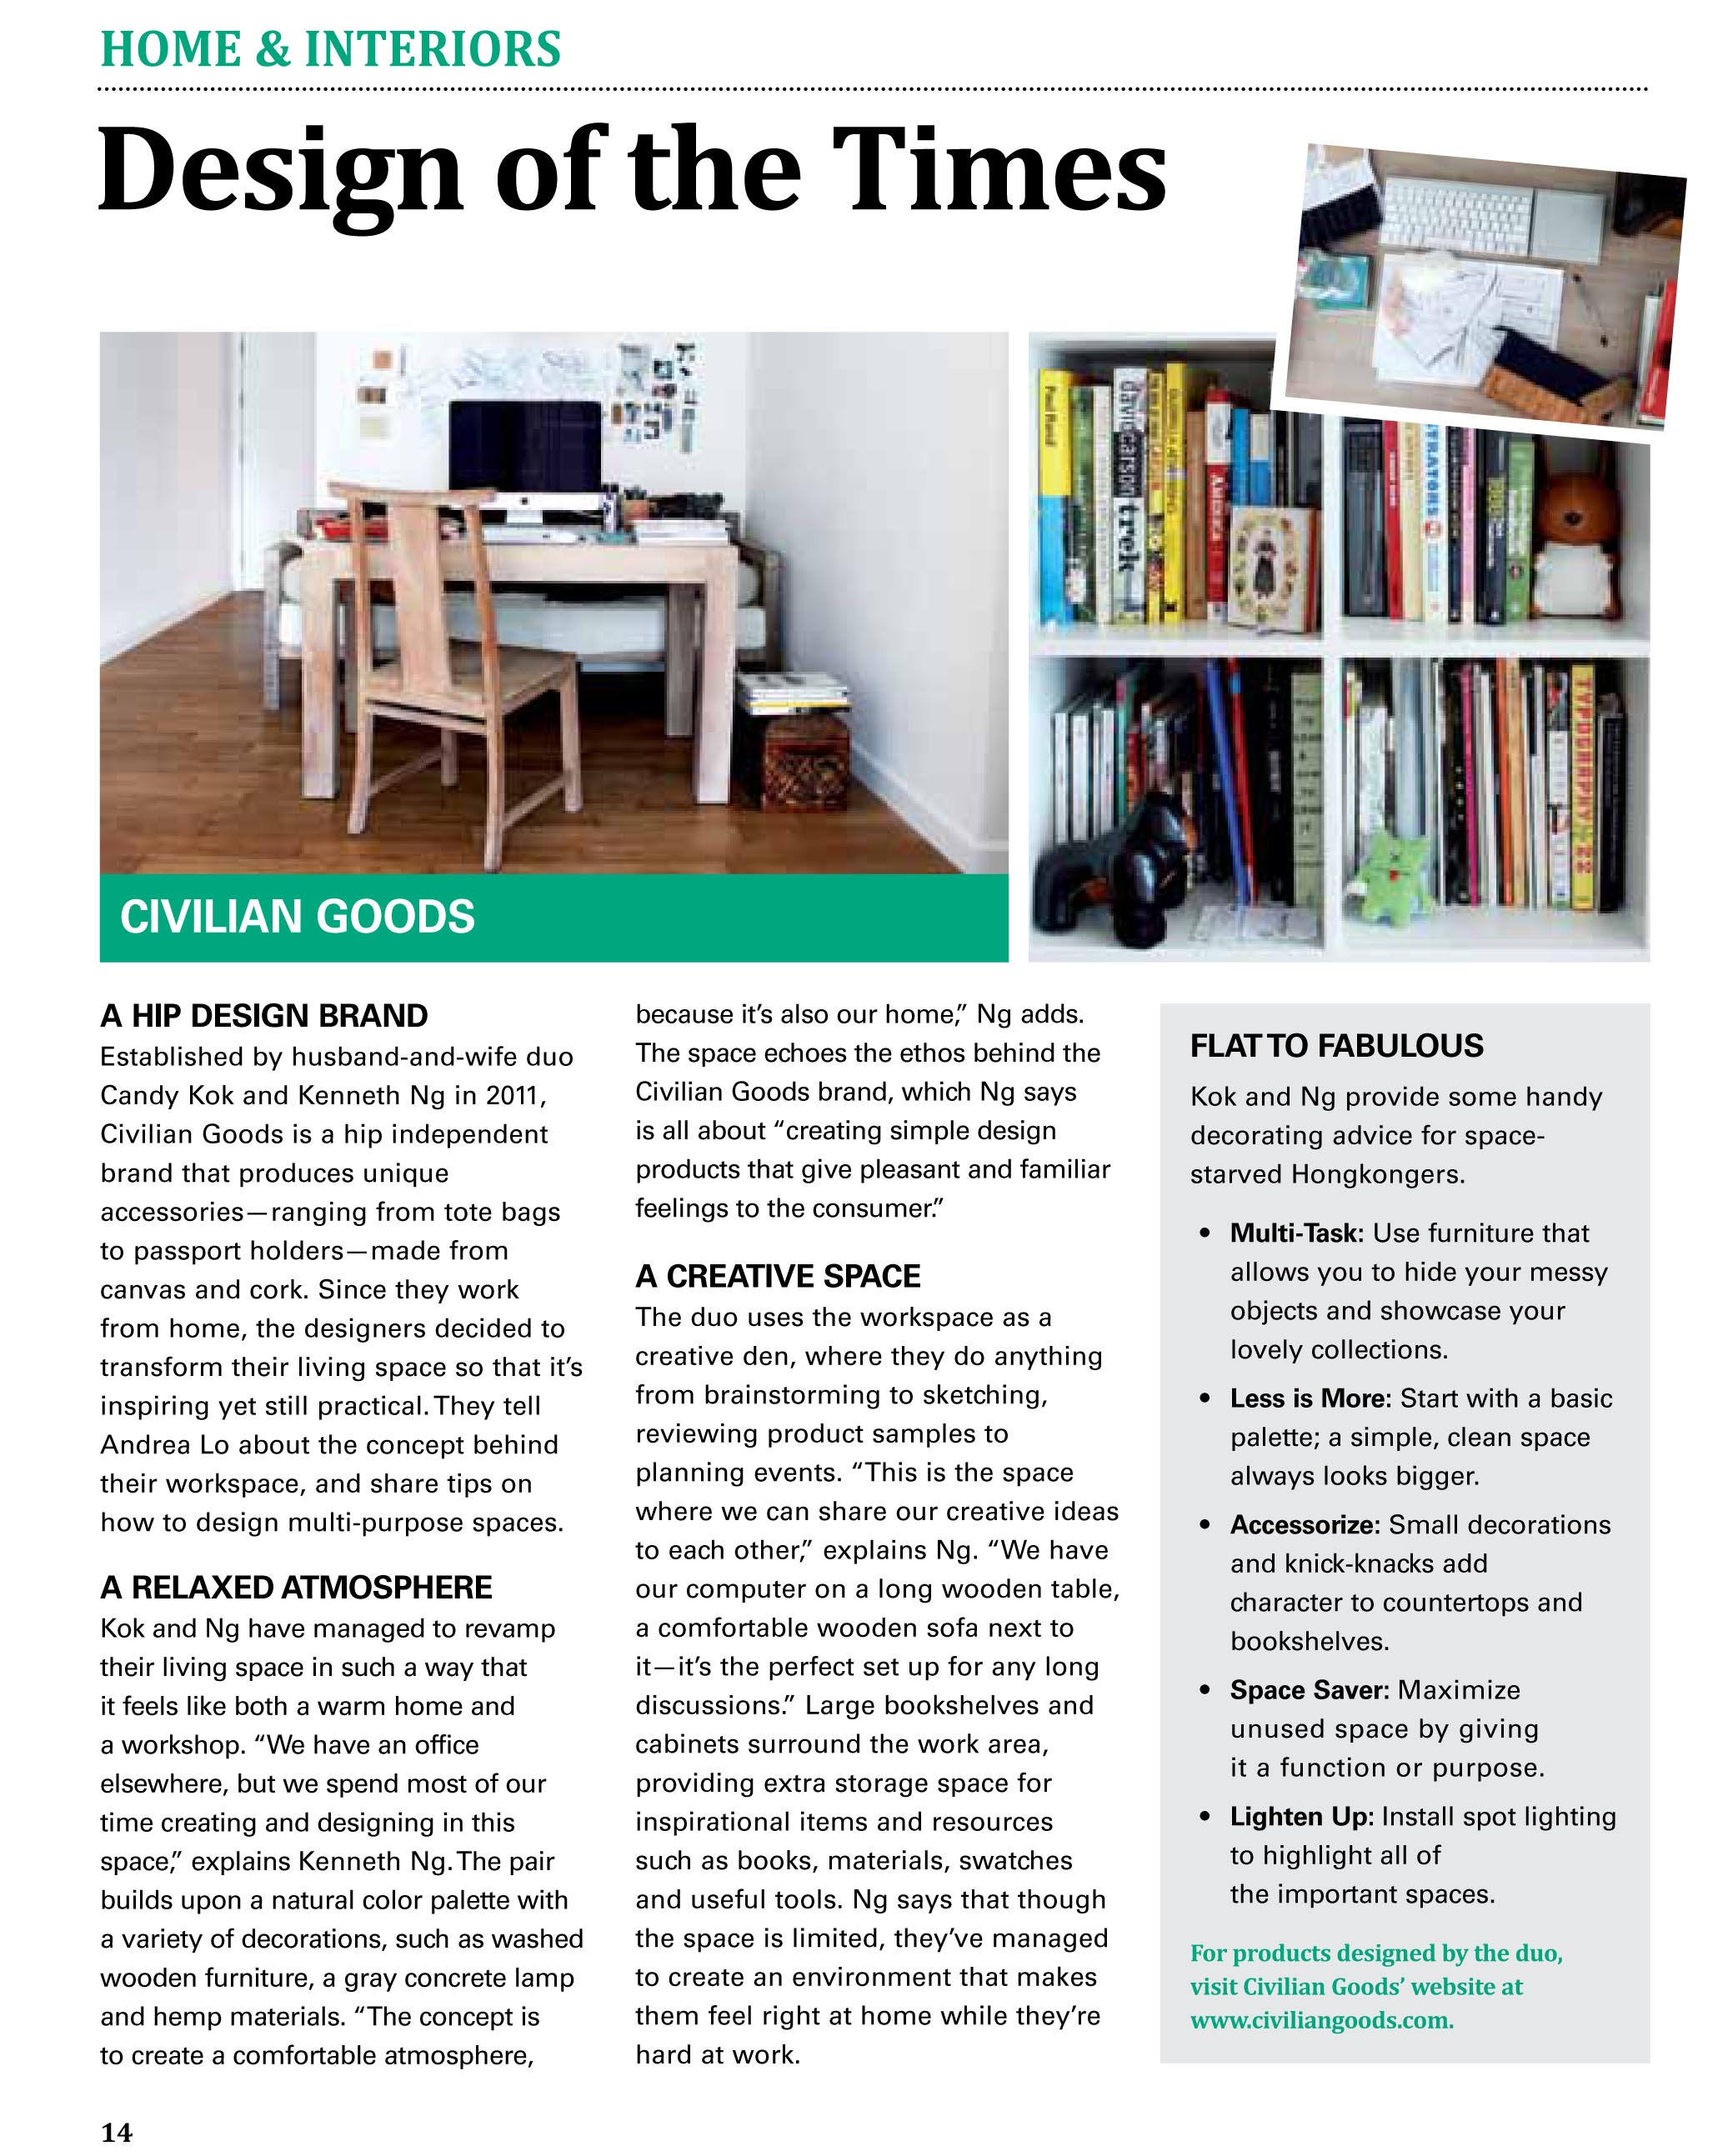 July 1st 2013: The List Magazine